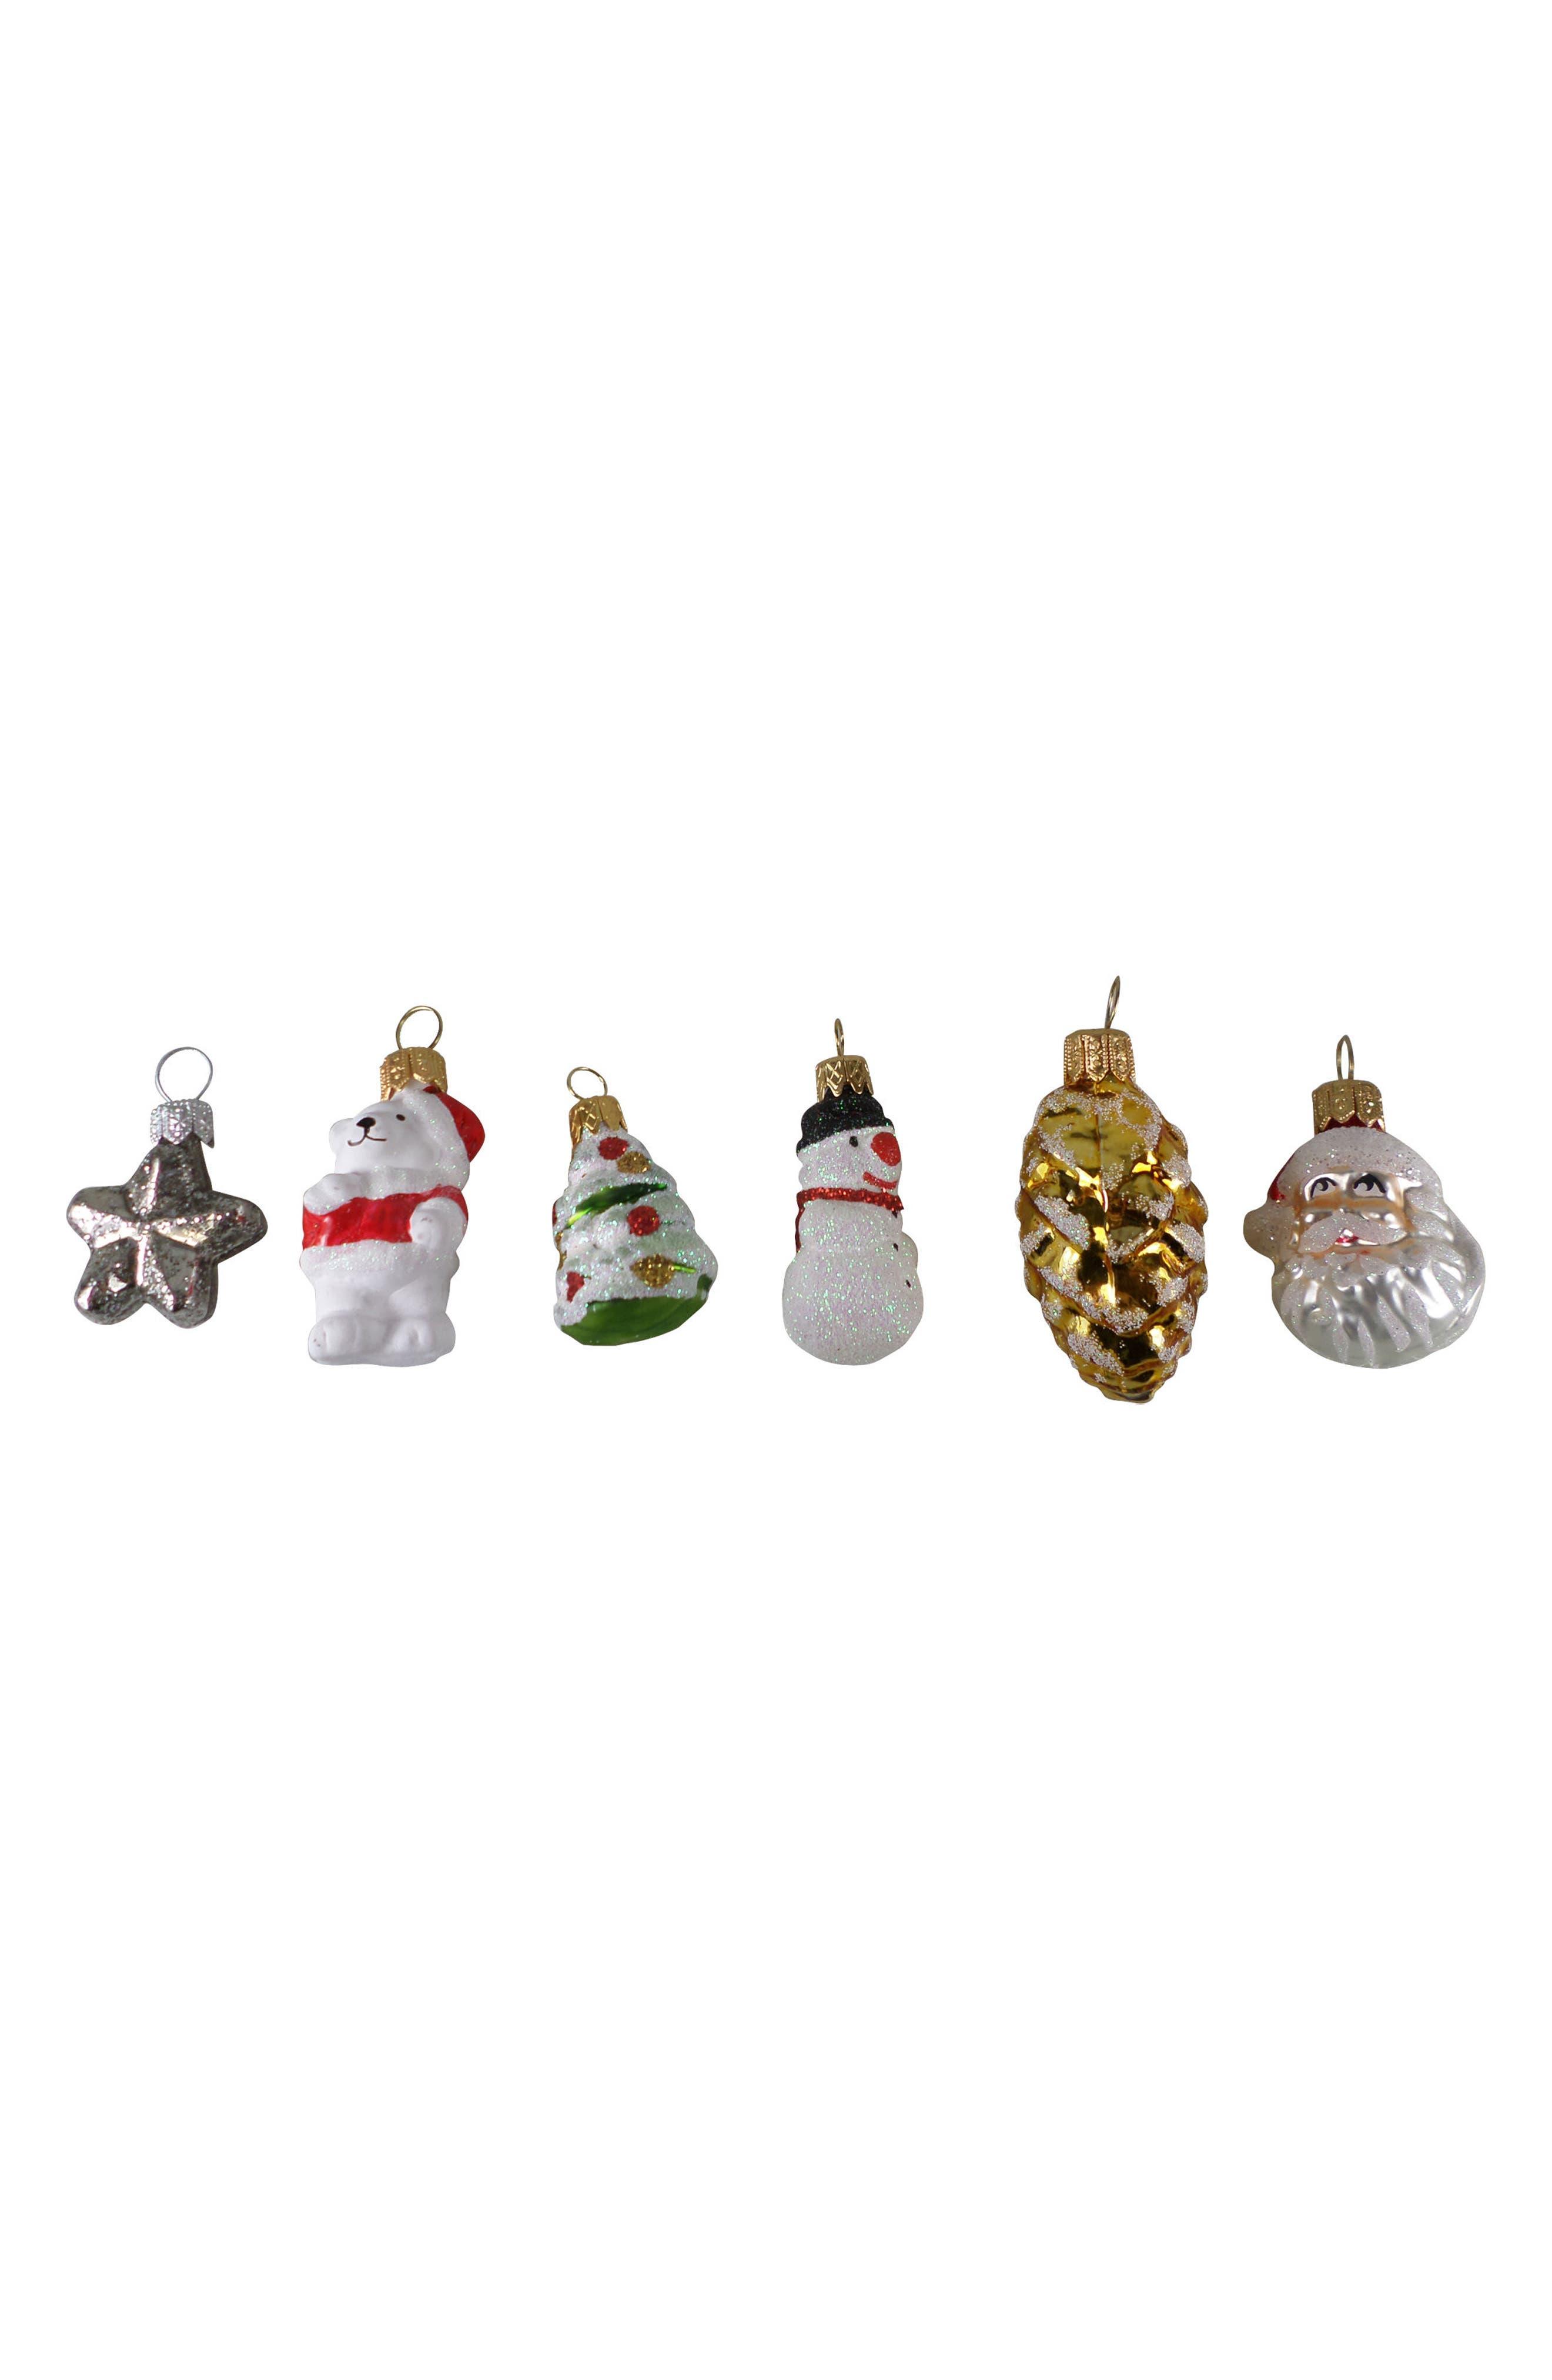 Set of 6 Mini Handblown Glass Christmas Ornaments,                             Main thumbnail 1, color,                             600